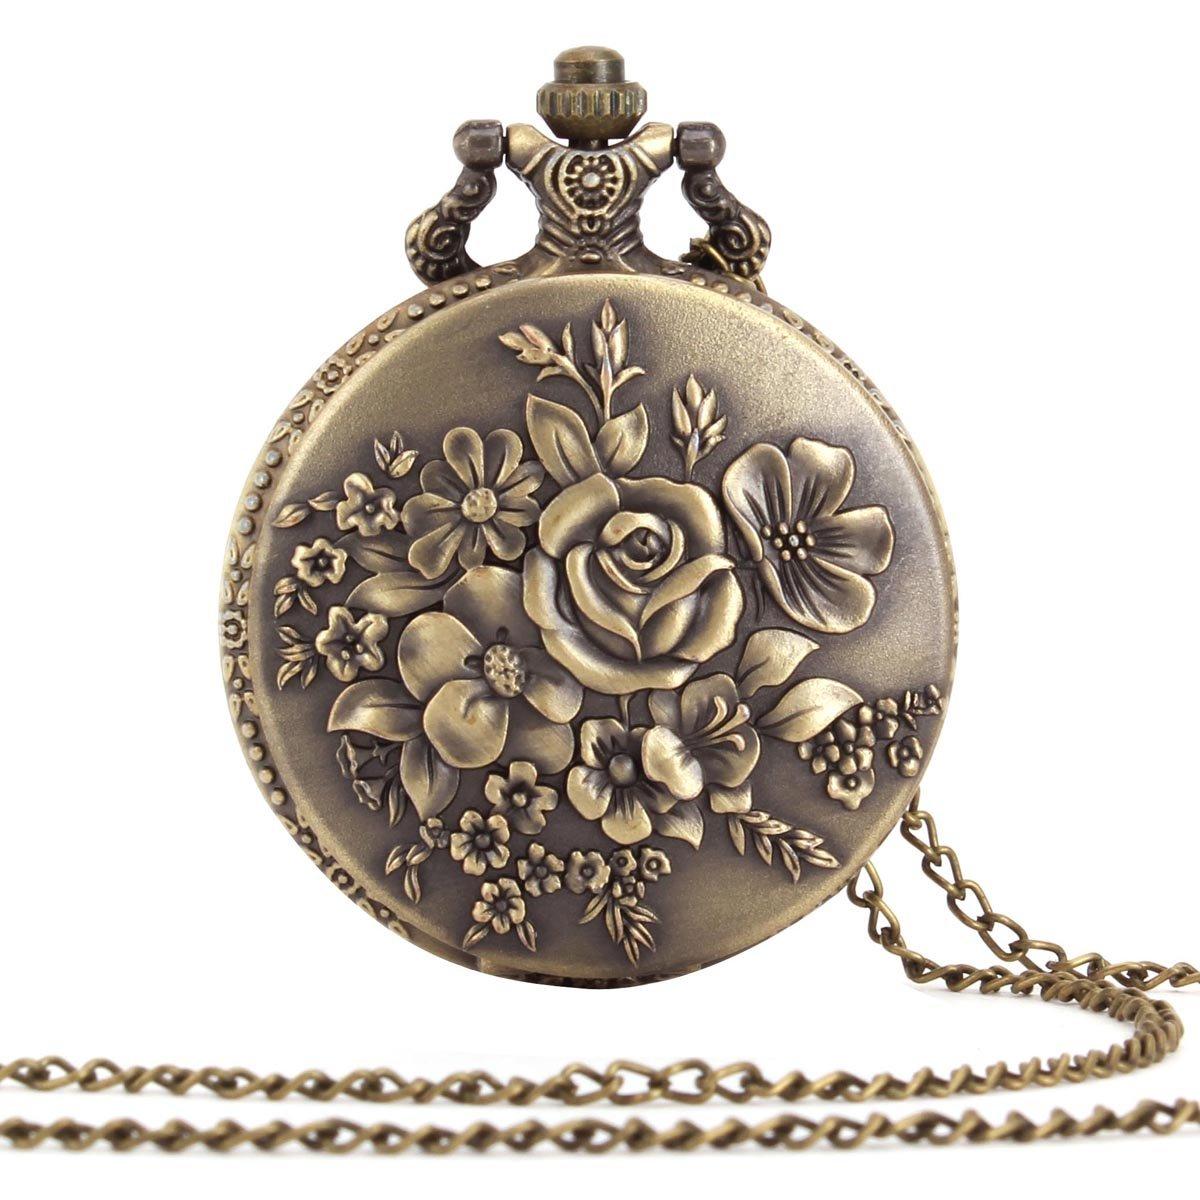 | ALIENWOLF Antique Analog Rib Pocket Watch Watches Pendant + Chain Flowers